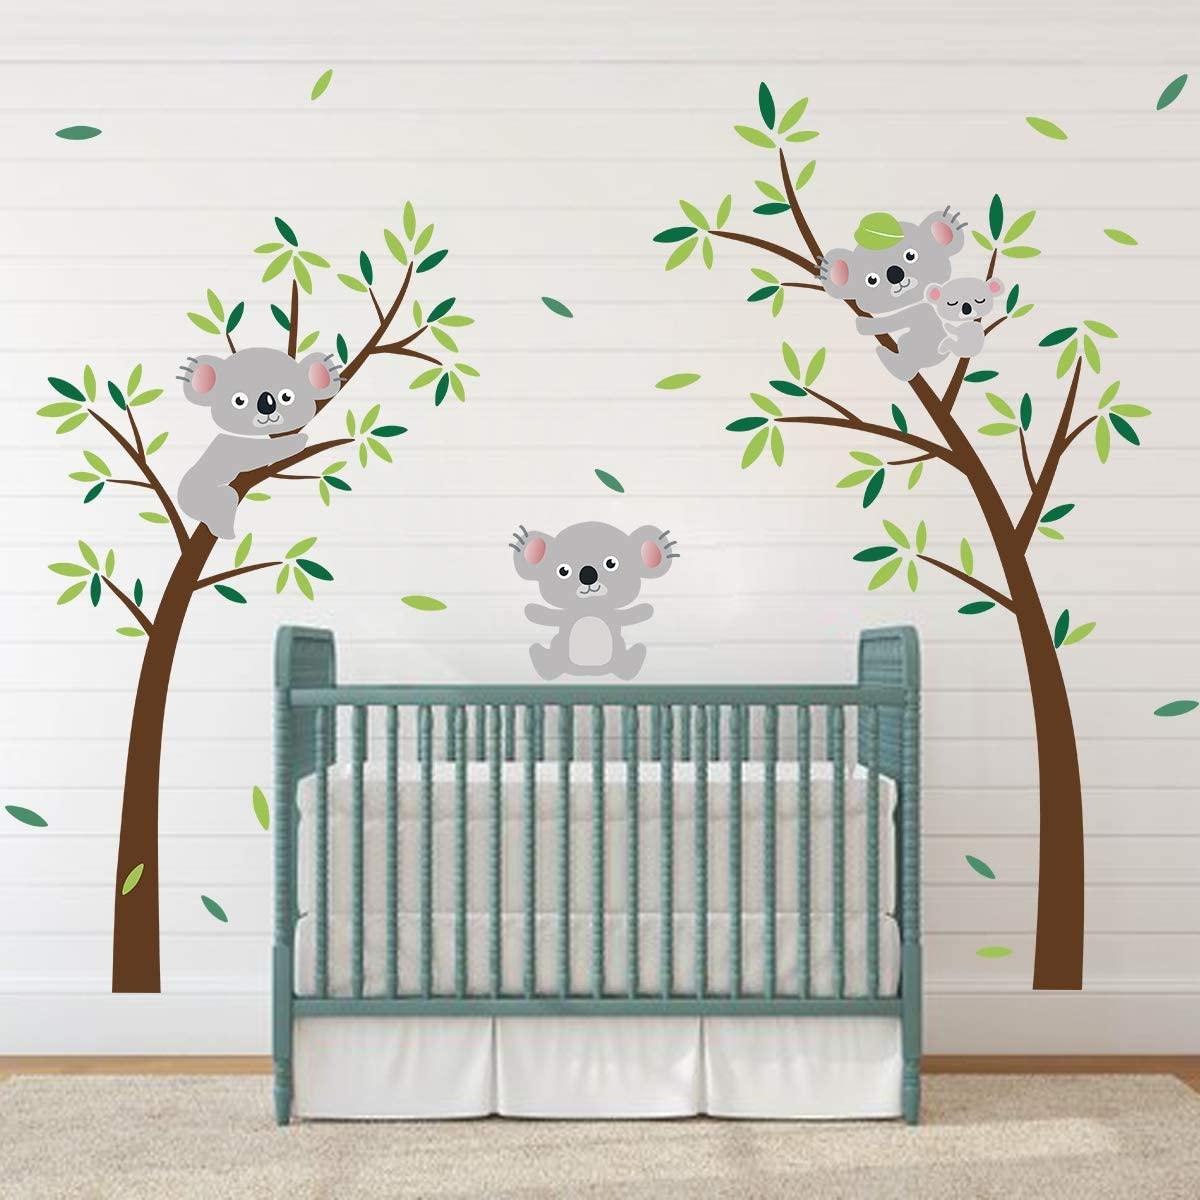 ufengke Koala Tree Wall Stickers Animal DIY Wall Decals Art Decor for Kids Bedroom Nursery Living Room